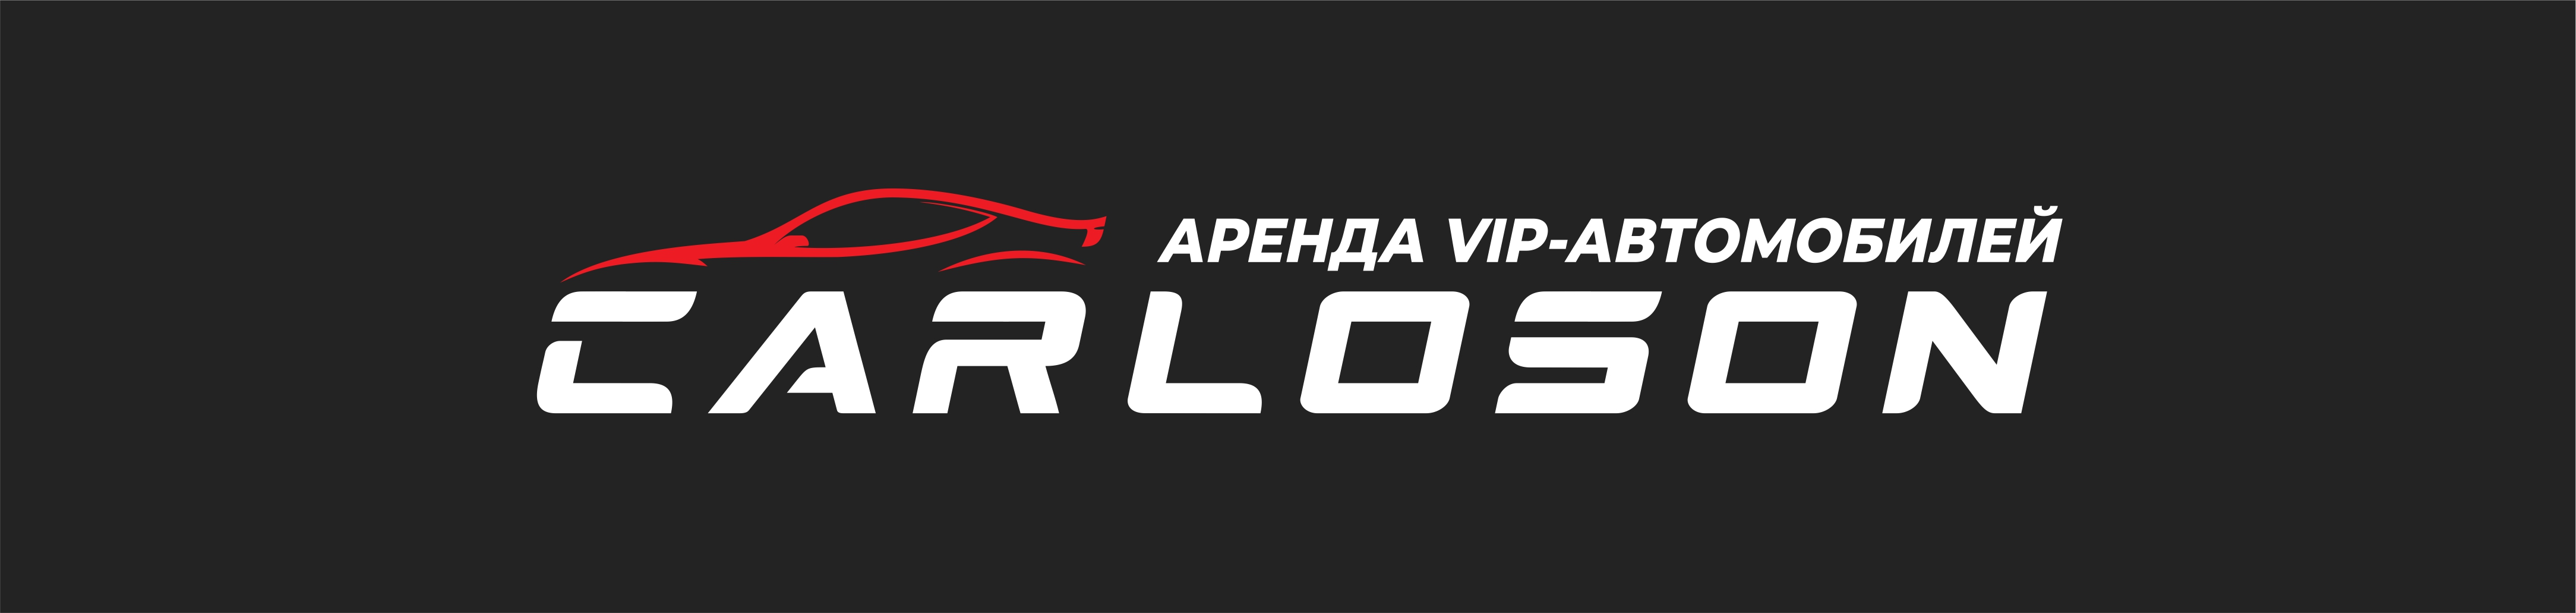 Логотип для компании по прокату  VIP автомобилей фото f_9335adccee2df2f2.jpg